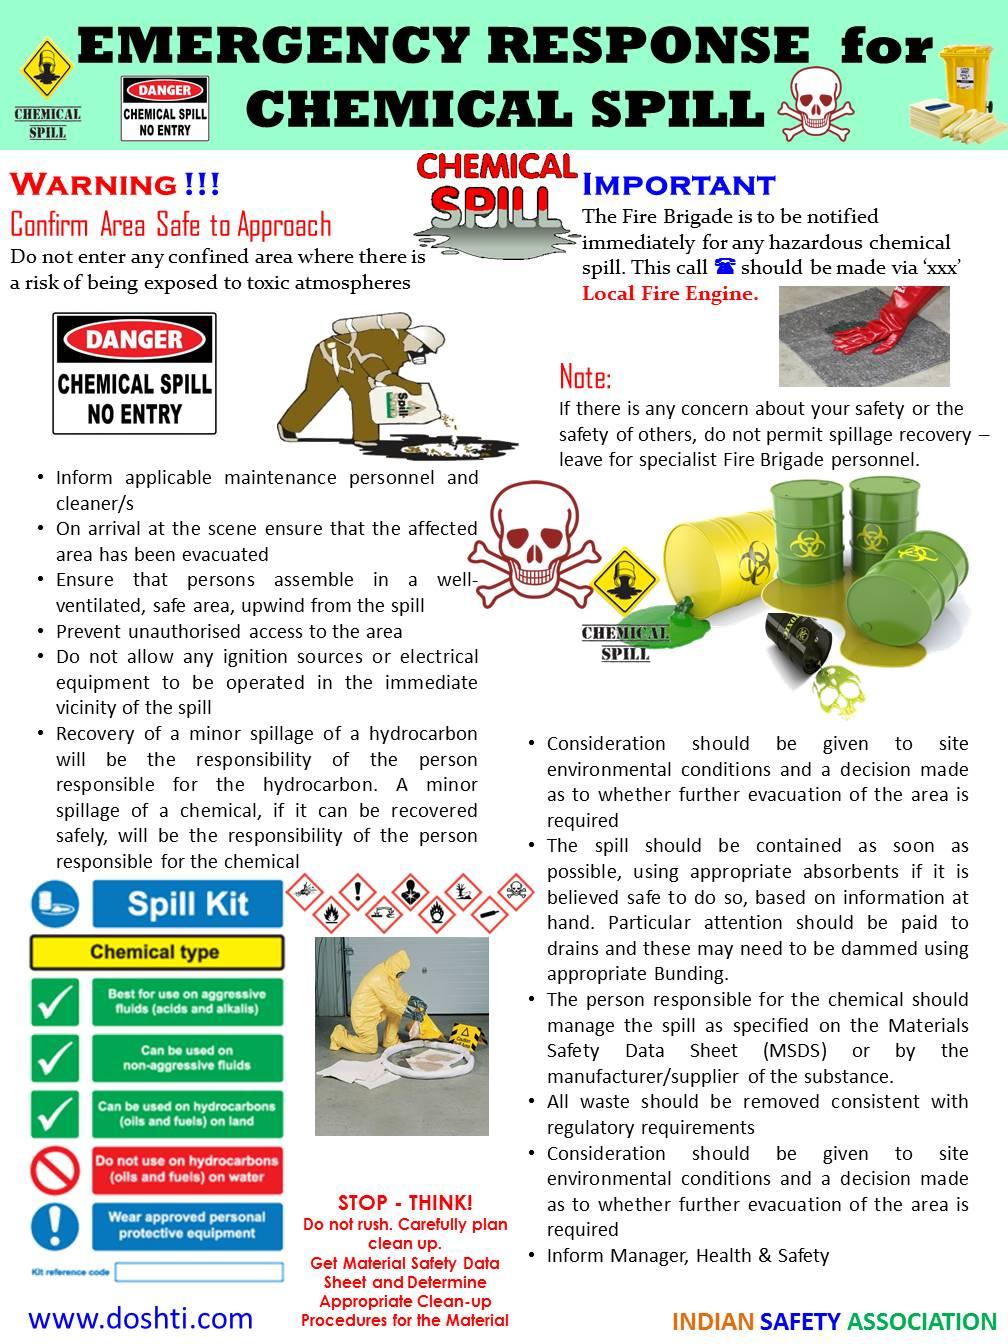 doshti emergency procedures chemical spills